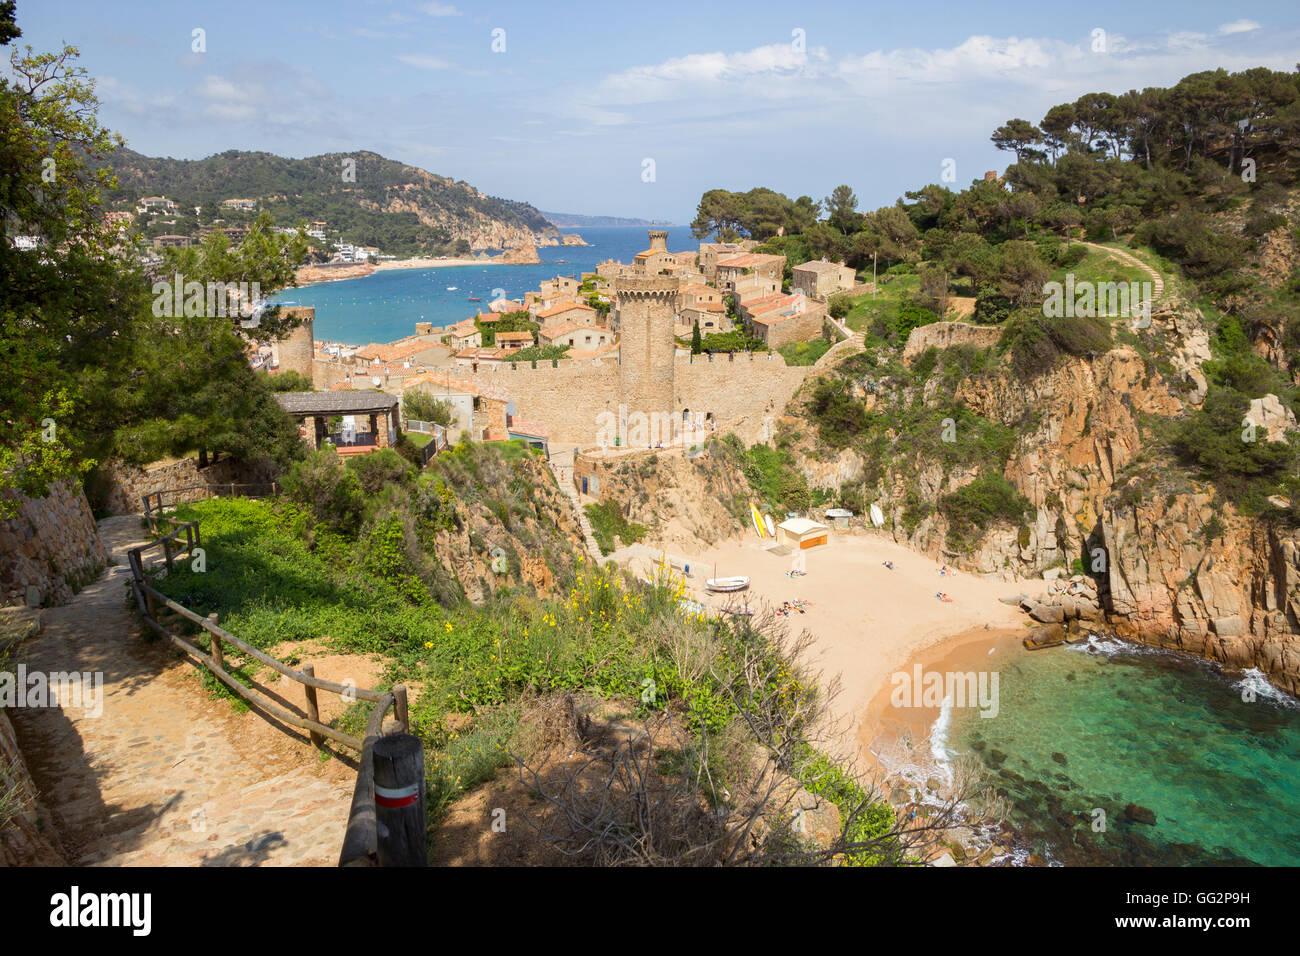 View on the historic part of Tossa de Mar. Costa Brava, Spain - Stock Image